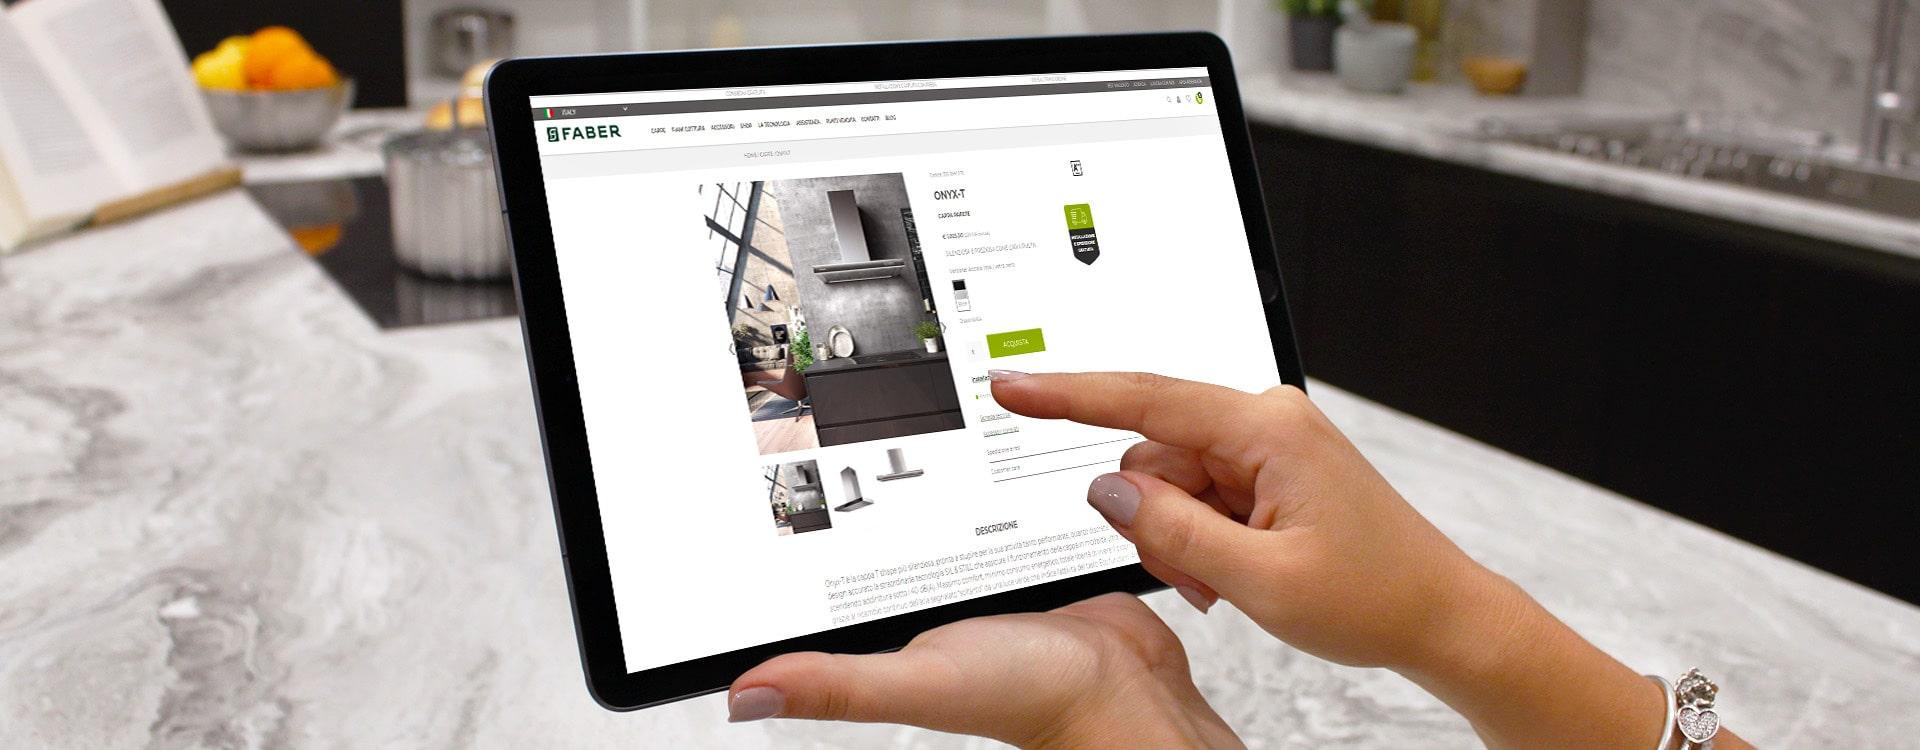 faber shop online